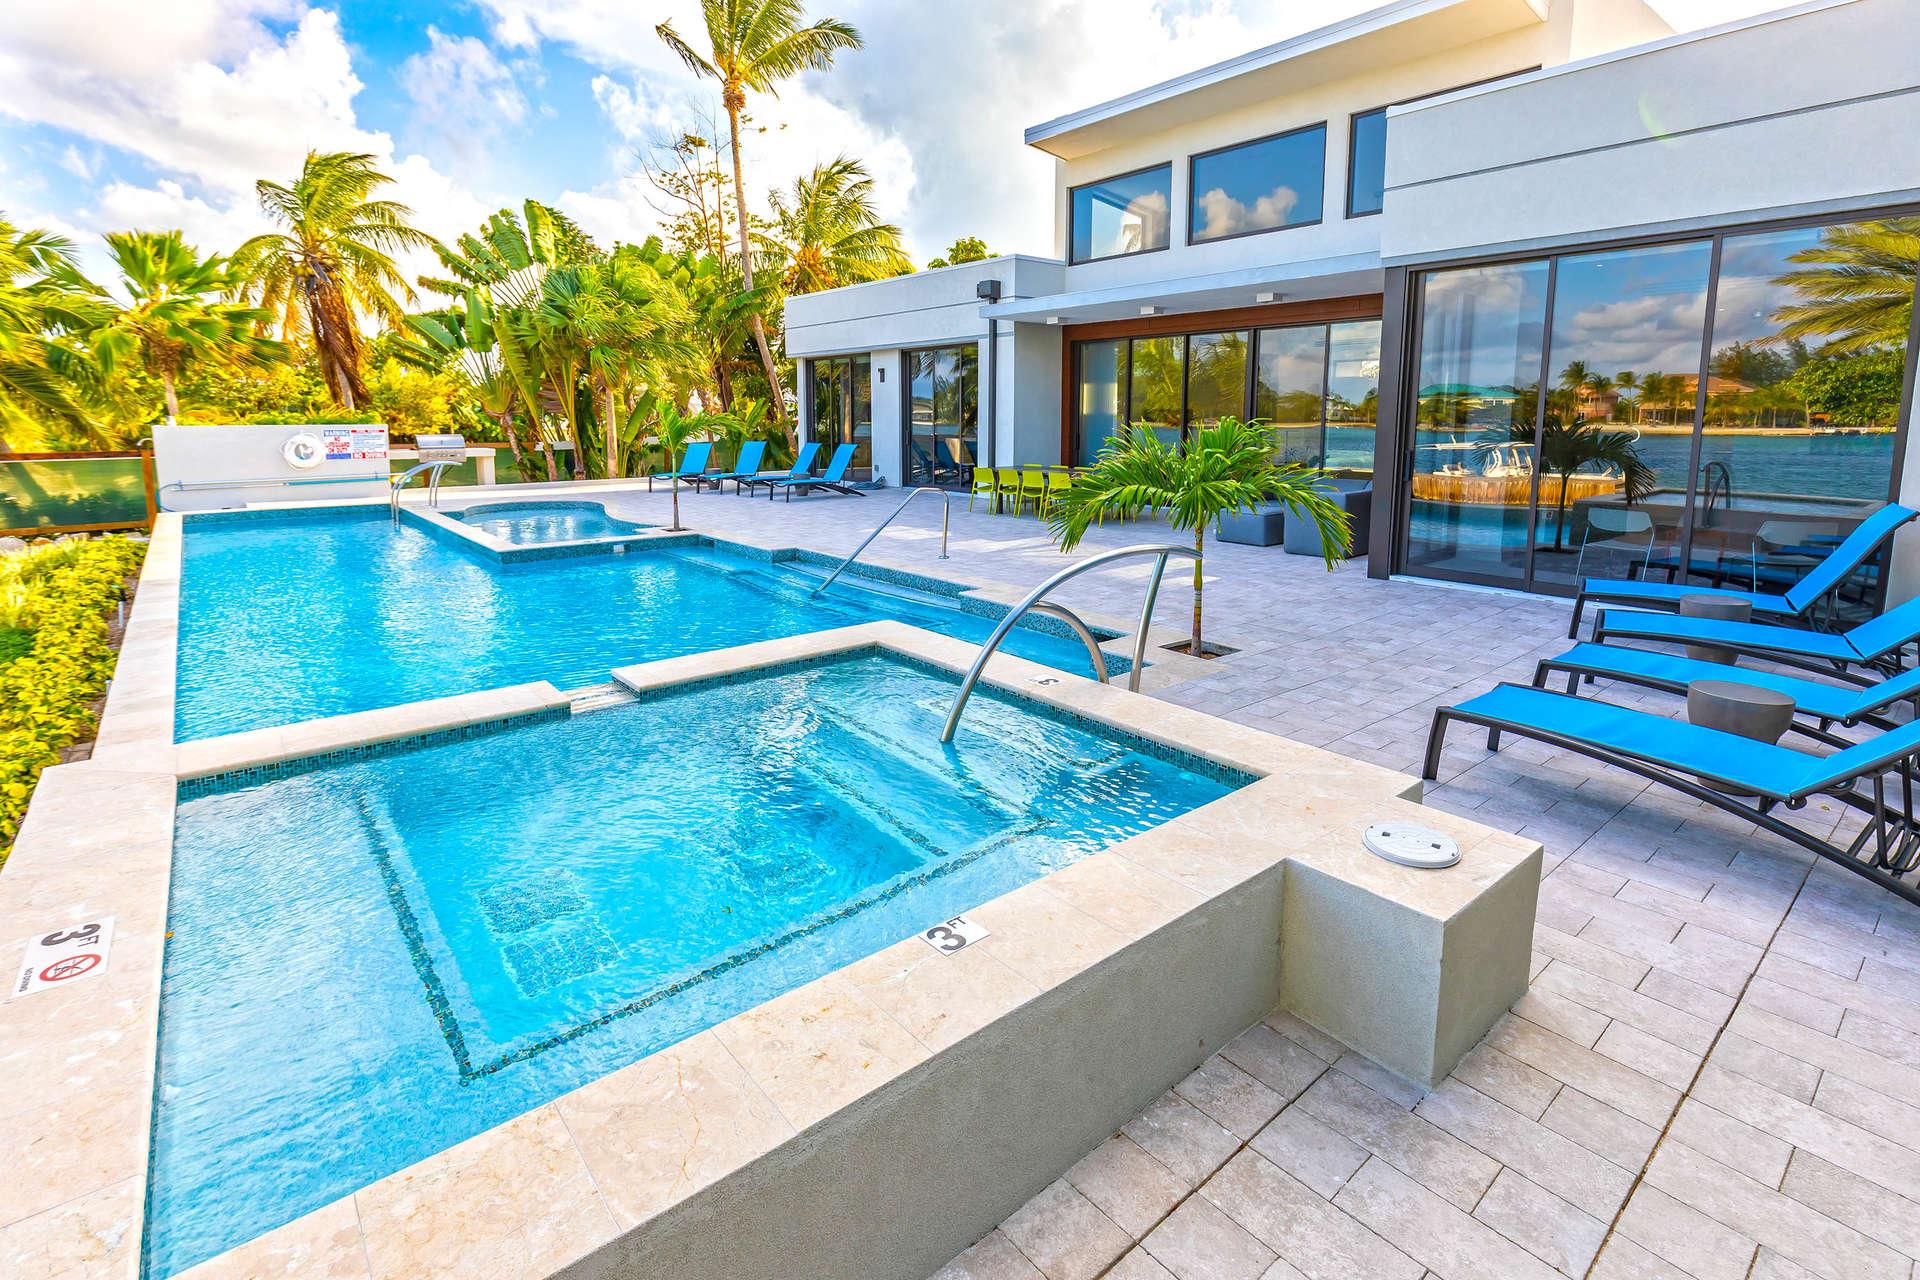 Luxury villa rentals caribbean - Cayman islands - Grand cayman - Cayman kai - White Dahlia - Image 1/25